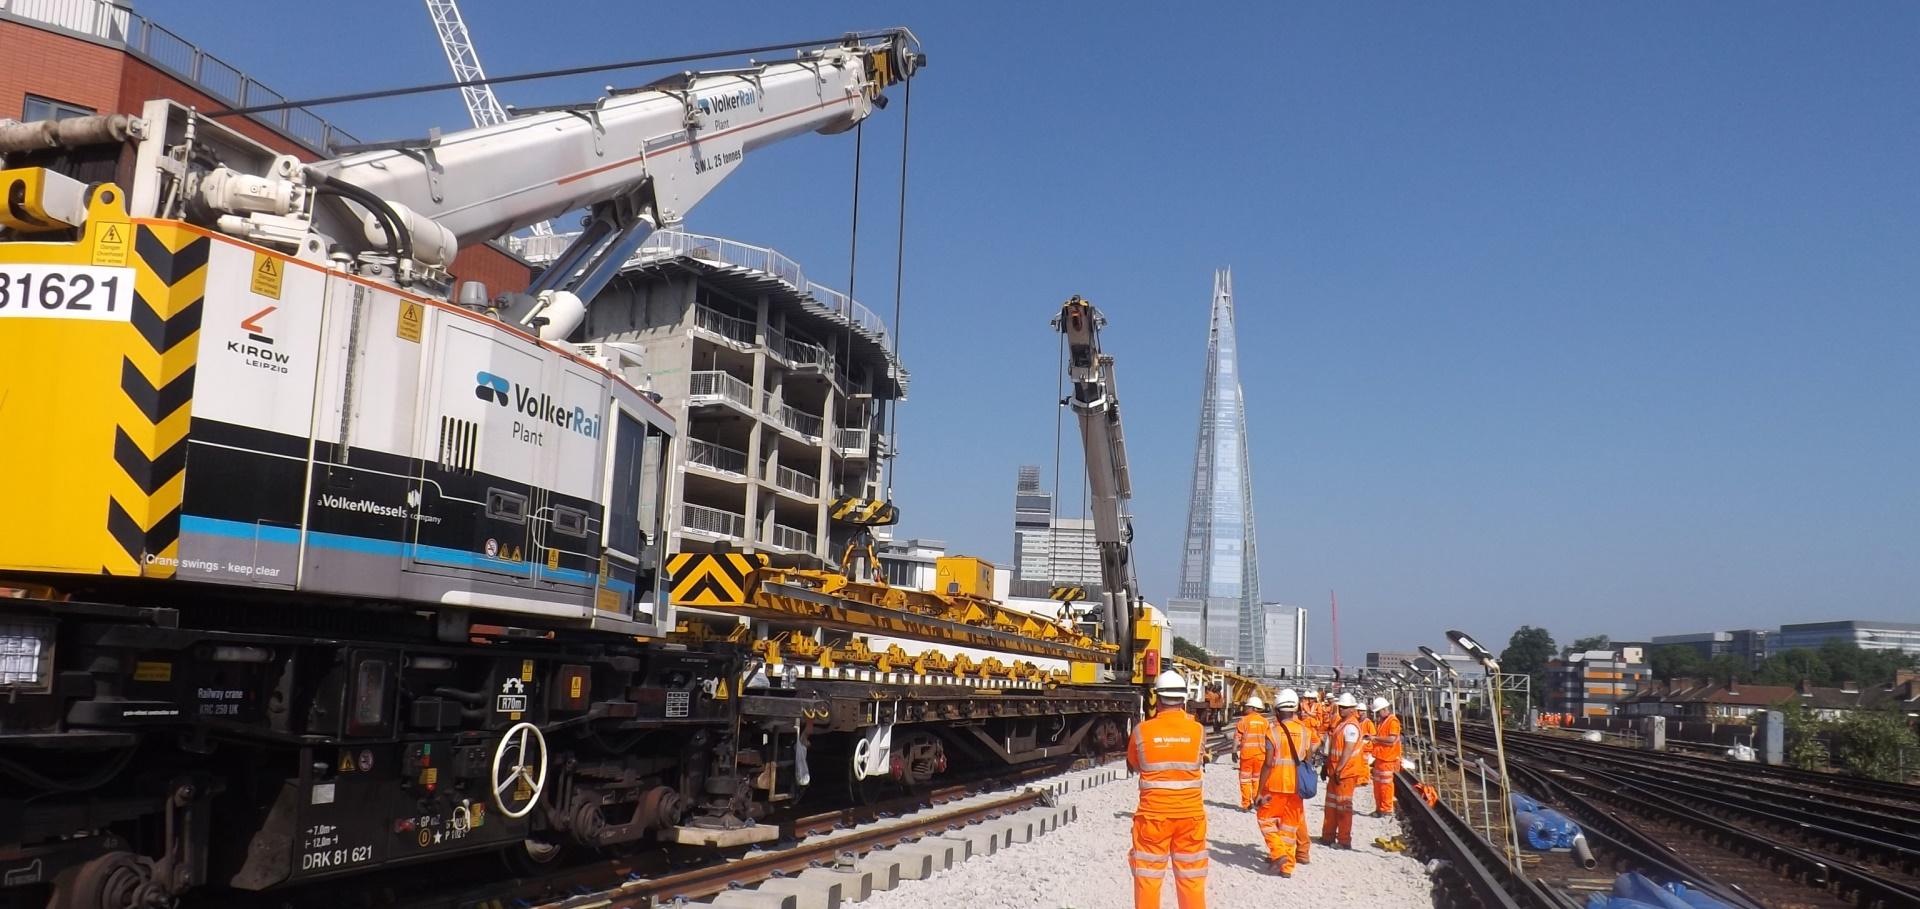 Kirow 250    810   1200 Rail Mounted Cranes